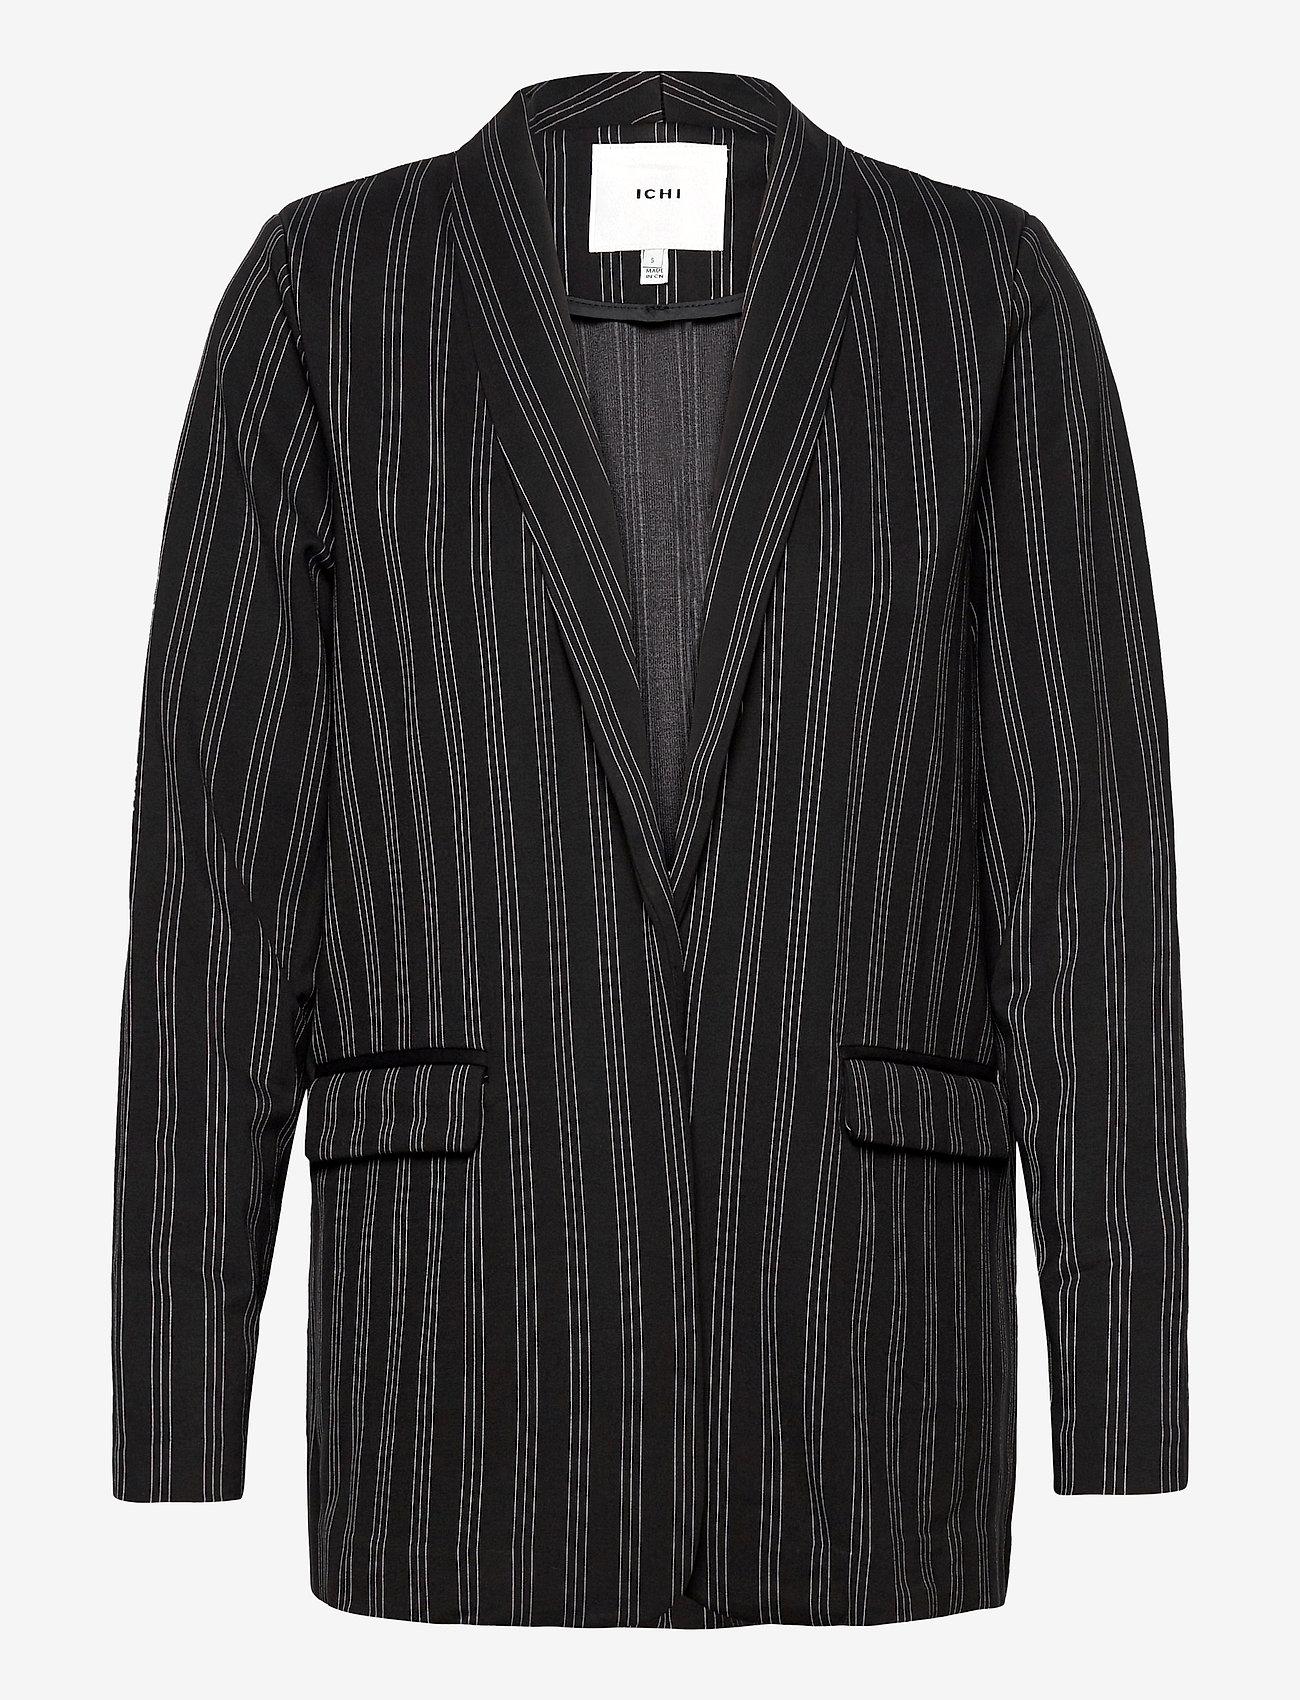 ICHI - IHRUTI BL 6 - oversize blazers - black - 0